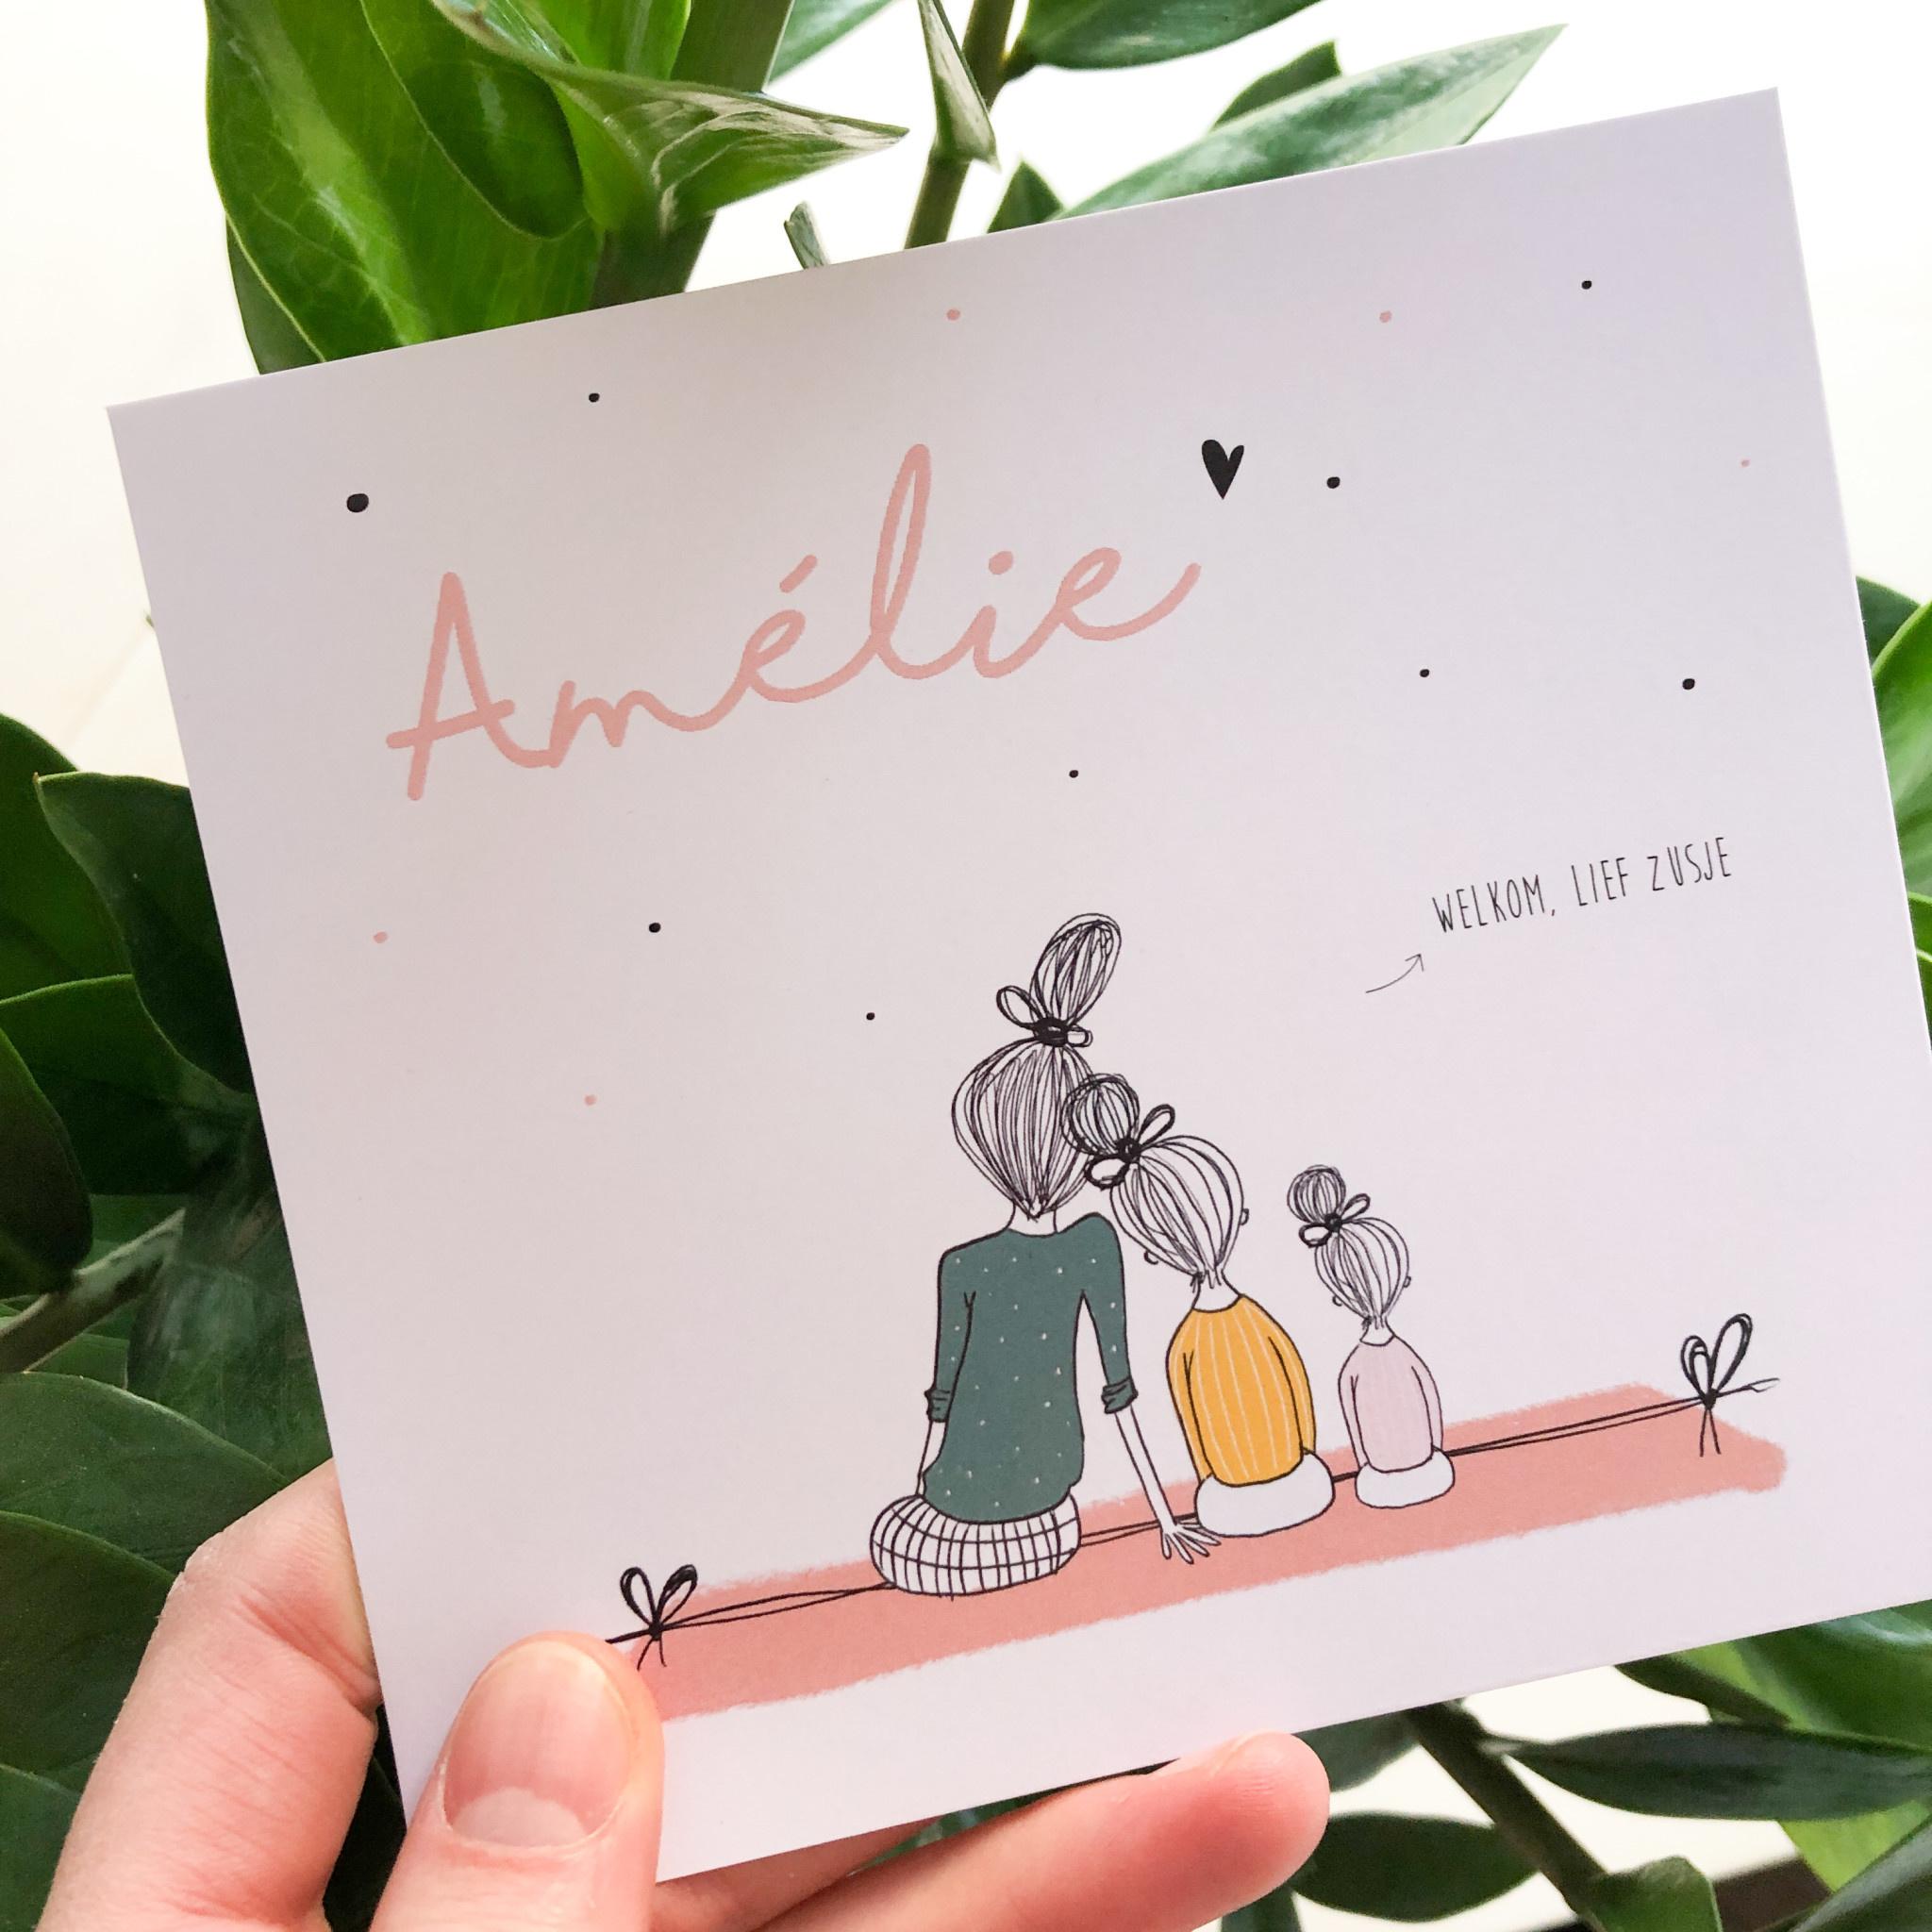 geboren_19nov Amélie